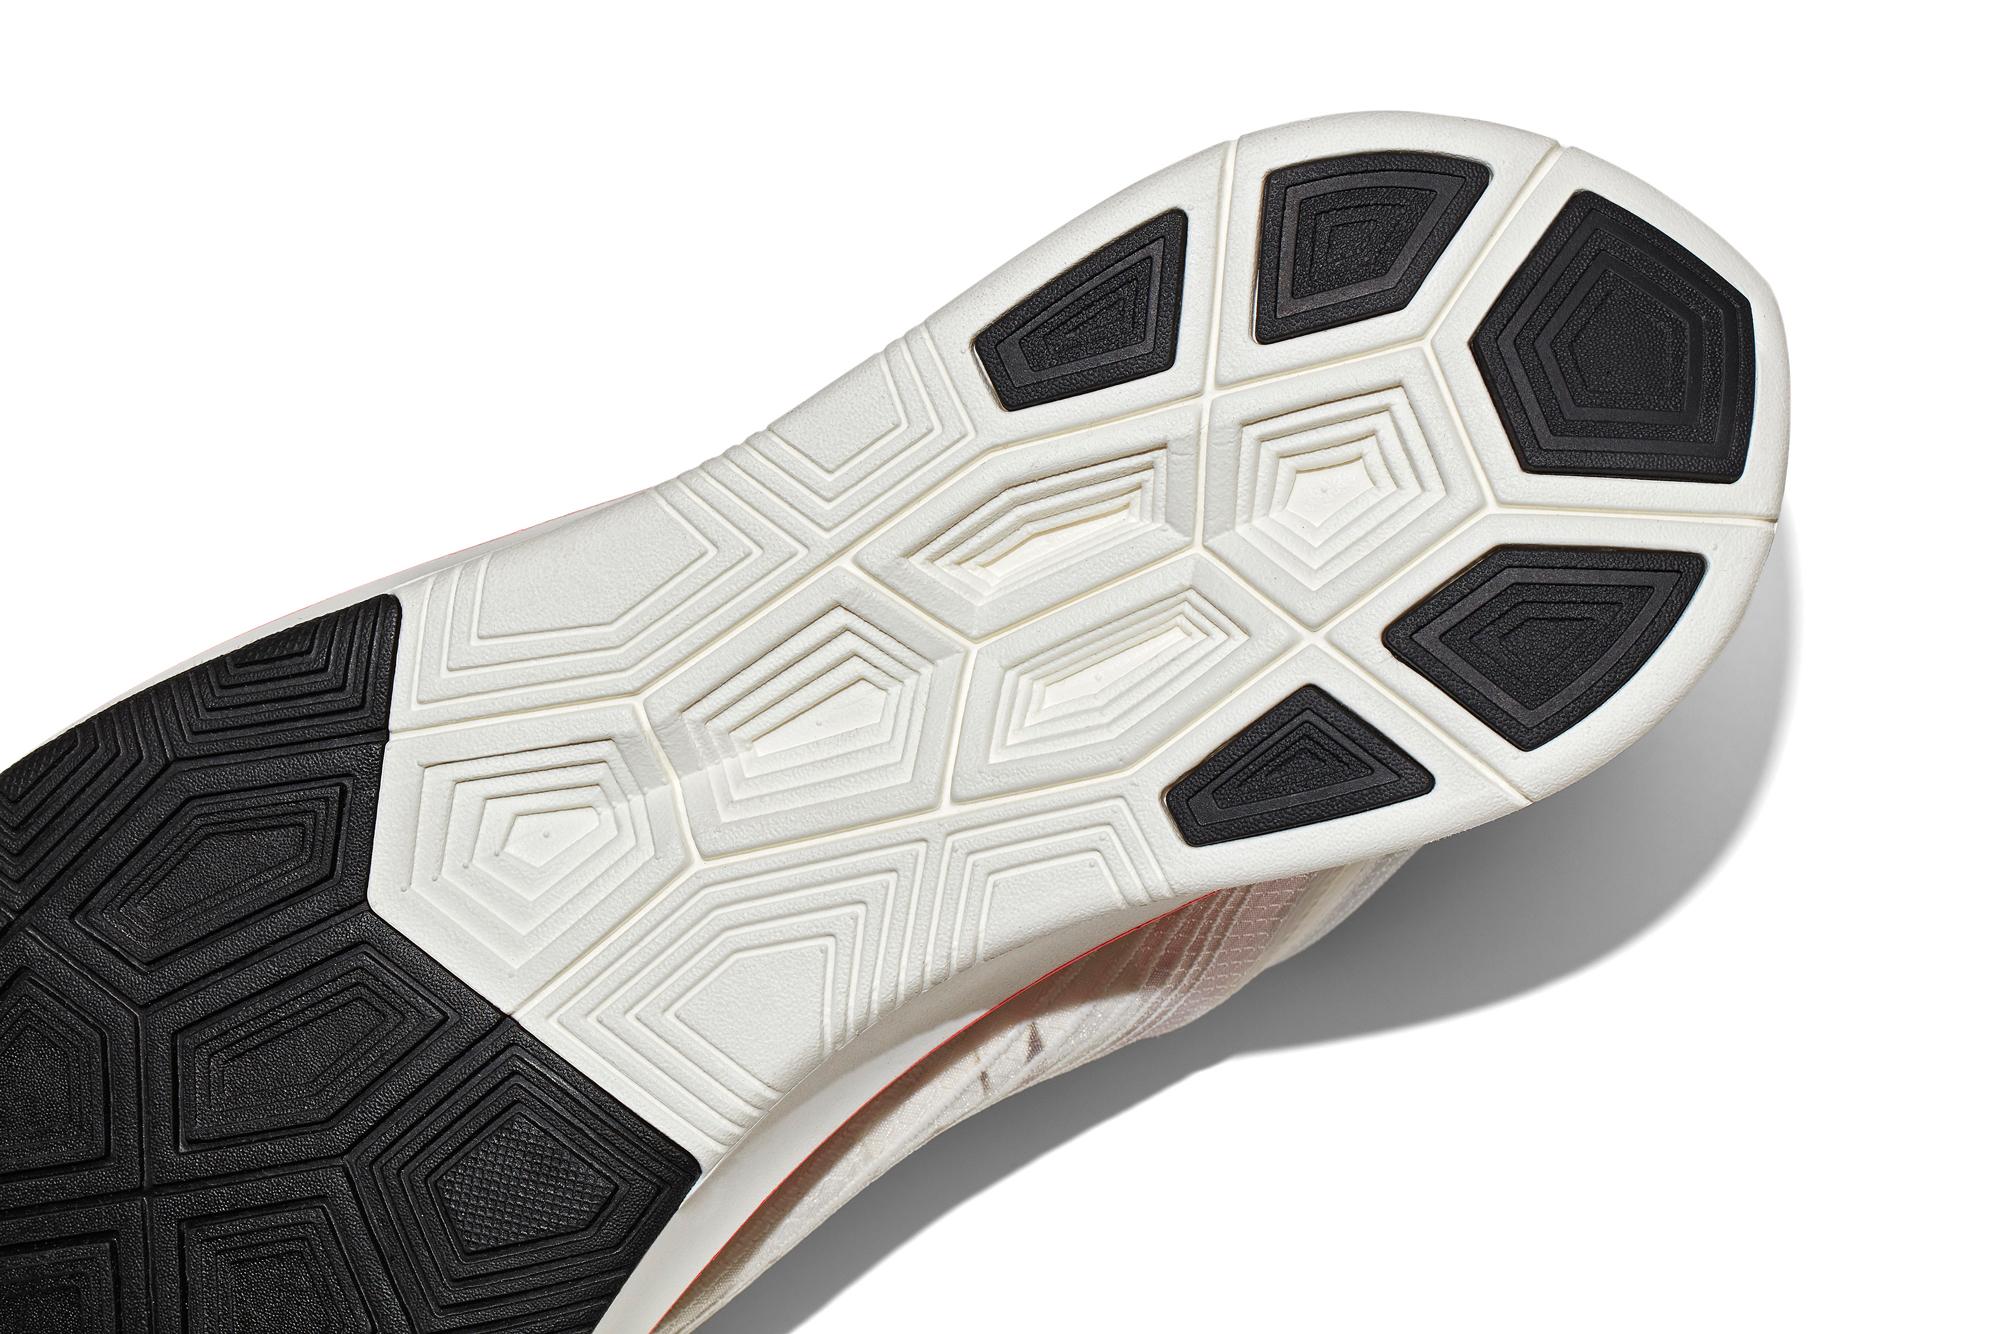 NikeLab-Zoom-VaporFly-SP-09